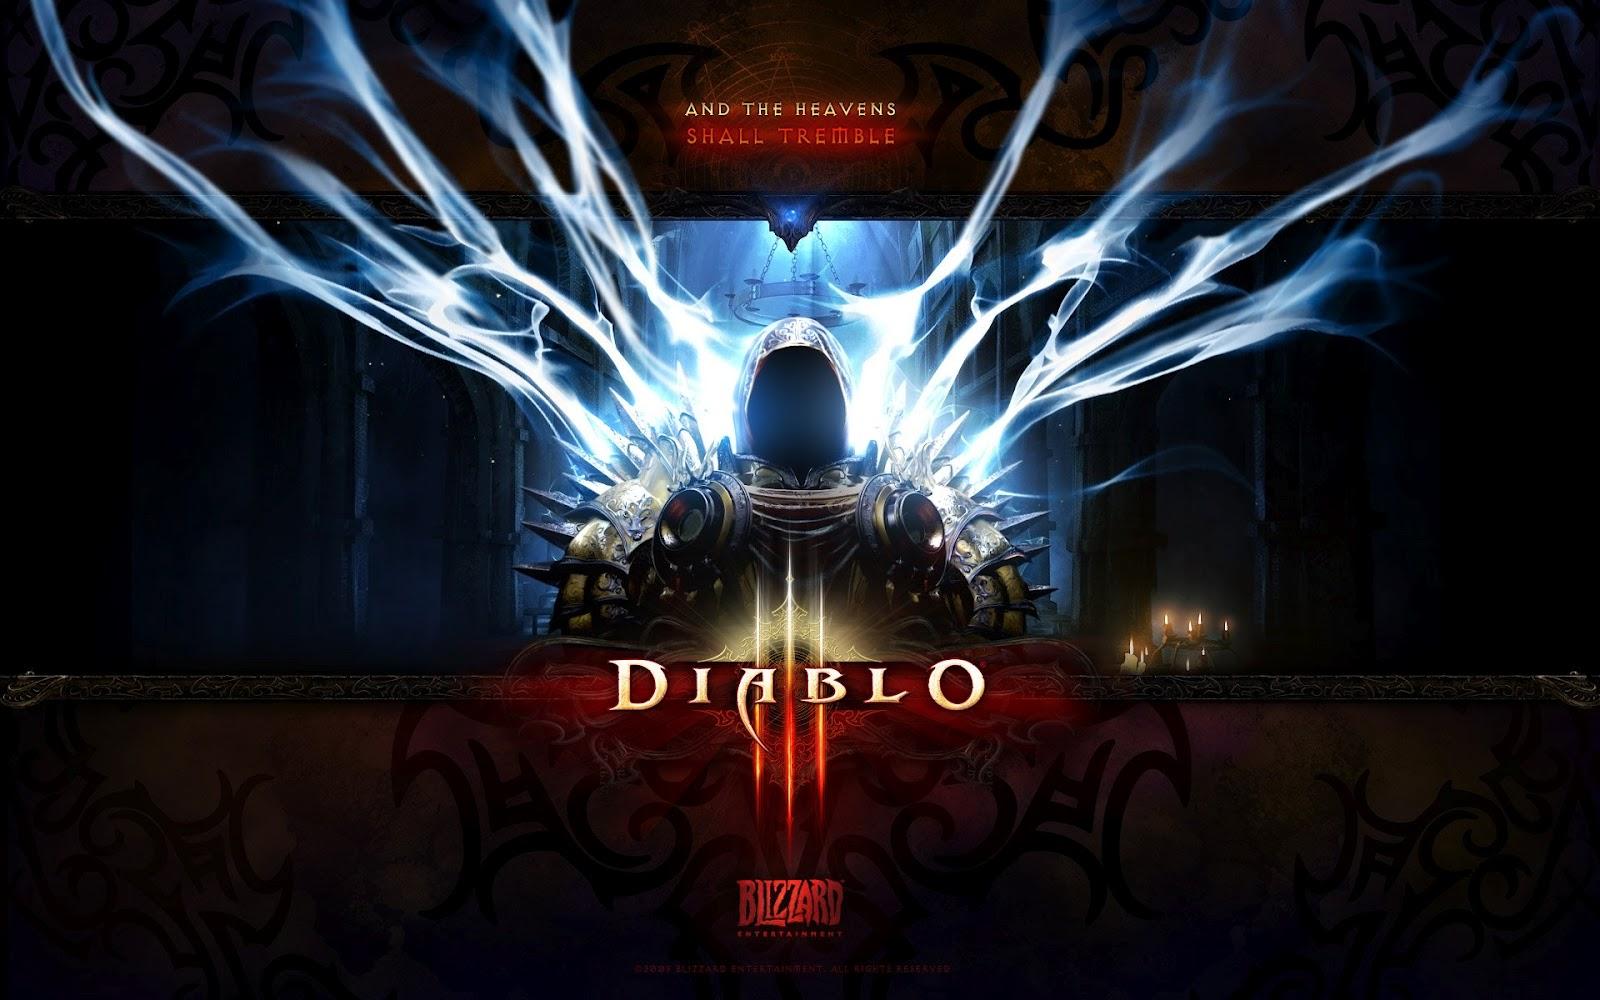 http://1.bp.blogspot.com/-Ljb621Z8erc/T0h5KVMIpYI/AAAAAAAAEdA/SDpAkW2nZh8/s1600/Free+Download+PC+Games+Diablo+III+Full+RIP+Version+3.jpg